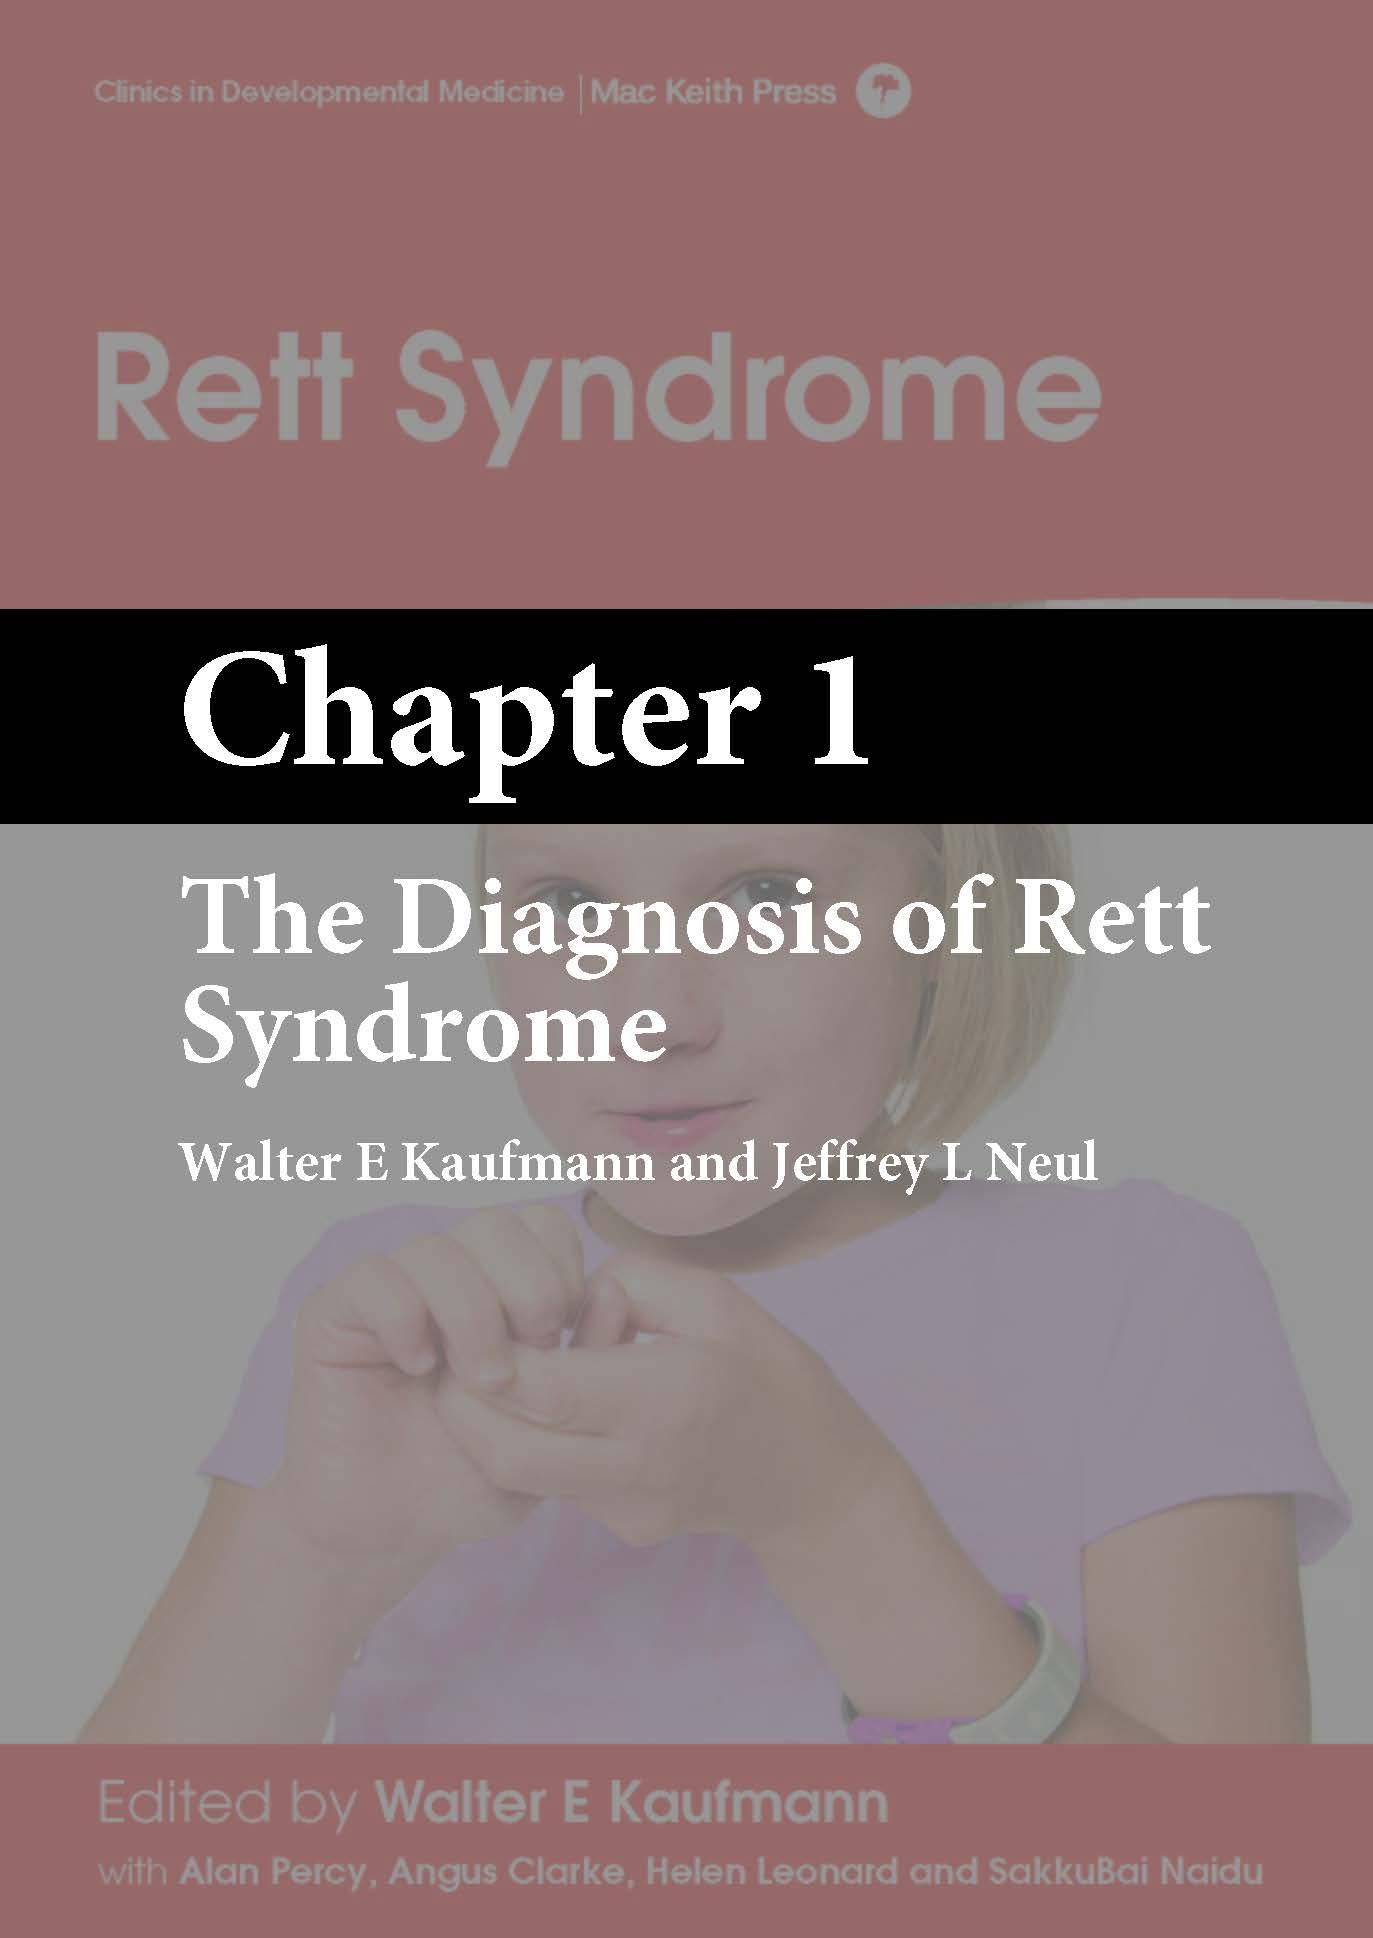 Rett Syndrome, Kaufmann, Chapter 1 cover